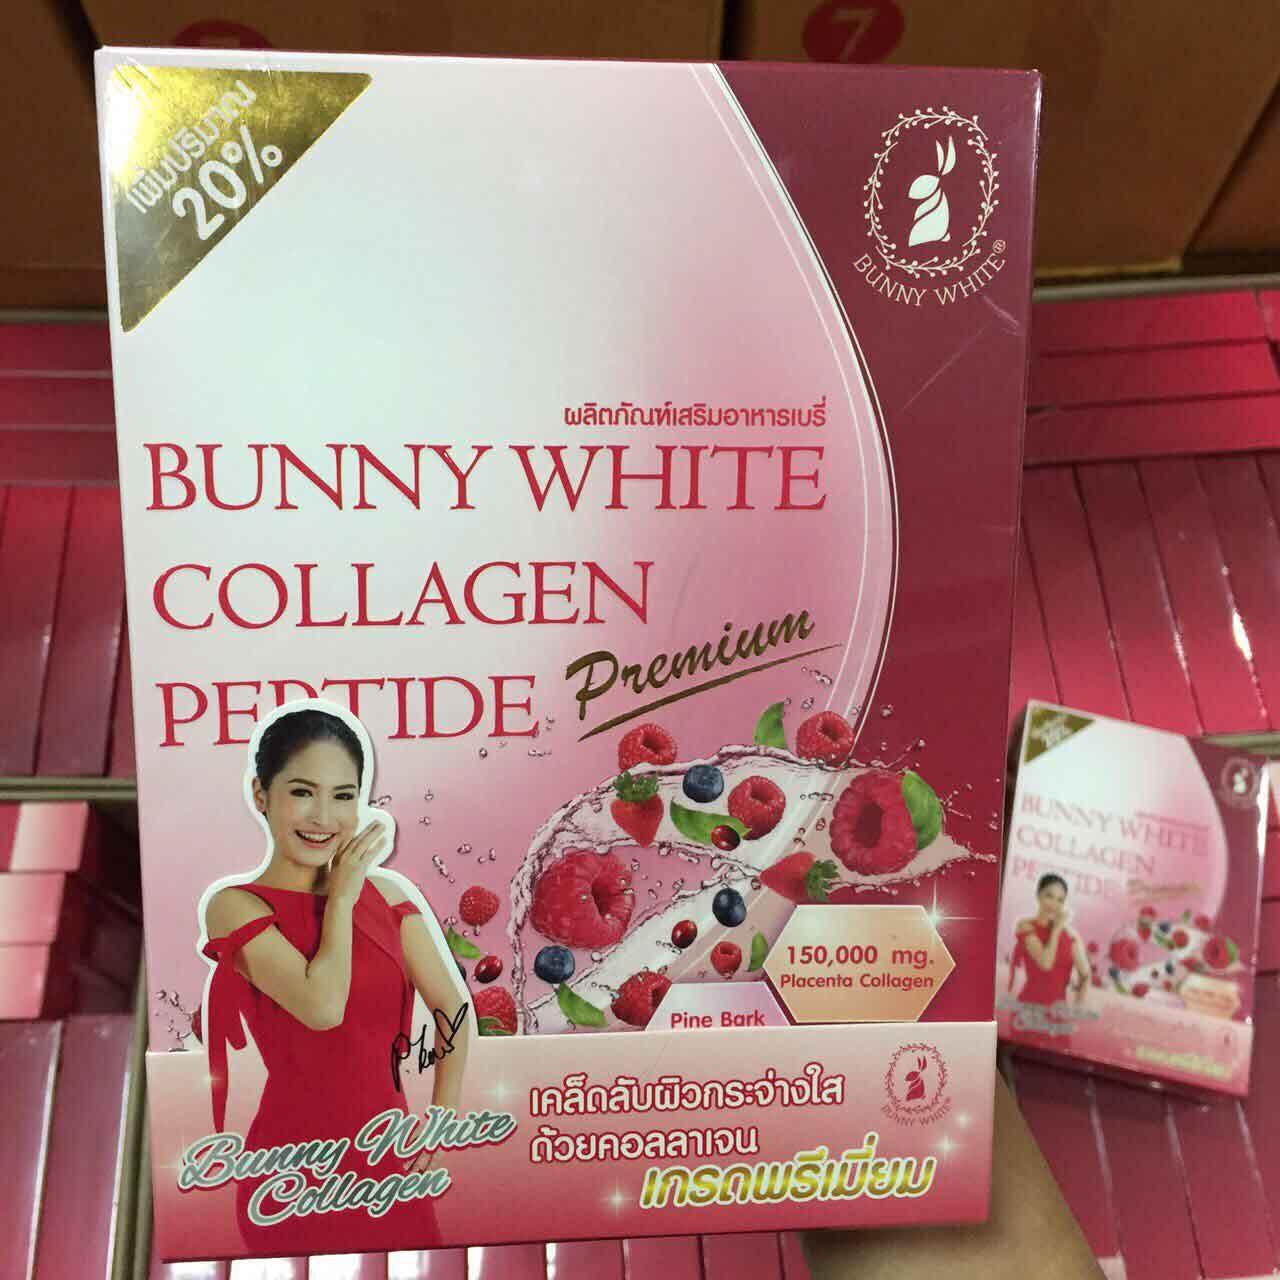 Bunny White Collagen 150,000mg. บันนี่ไวท์ คอลลาเจน แพ็คเกจใหม่